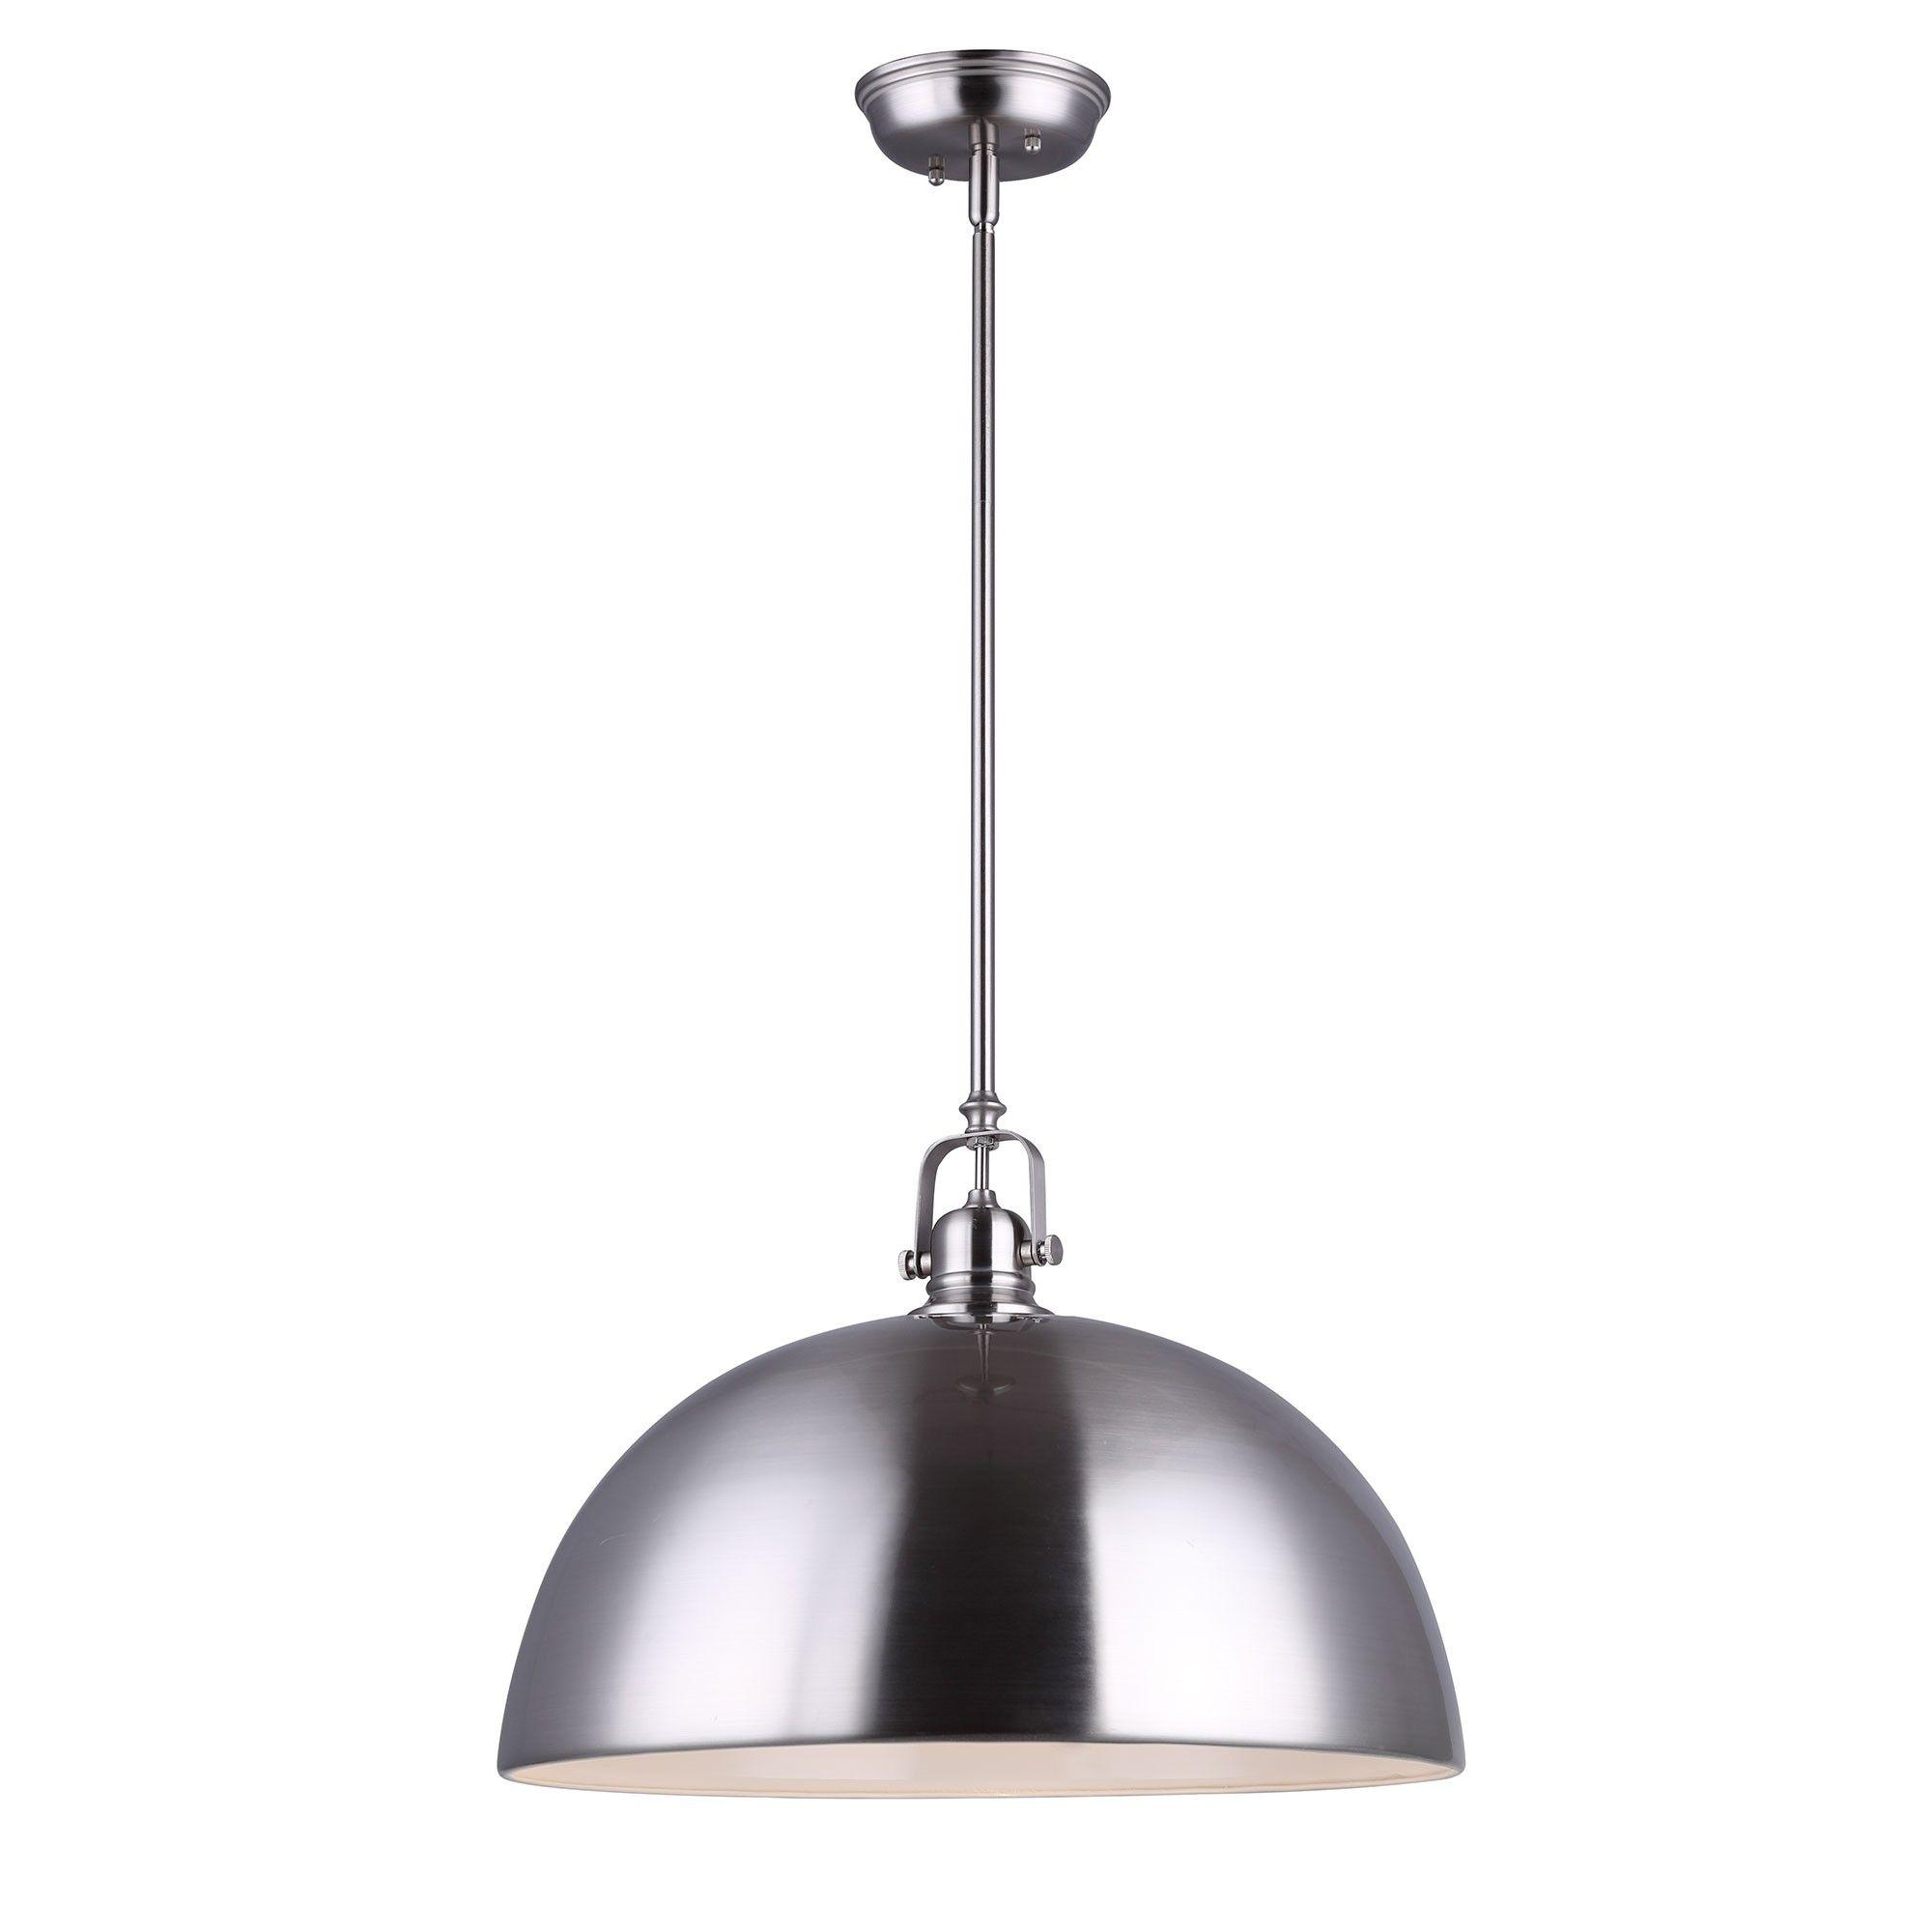 Canarm Ipl222b01bn16 Polo Kitchen And Bar Large Pendant Light Fixture Brushed Nickel Shade Large Pendant Lighting Pendant Light Fixtures Light Fixtures